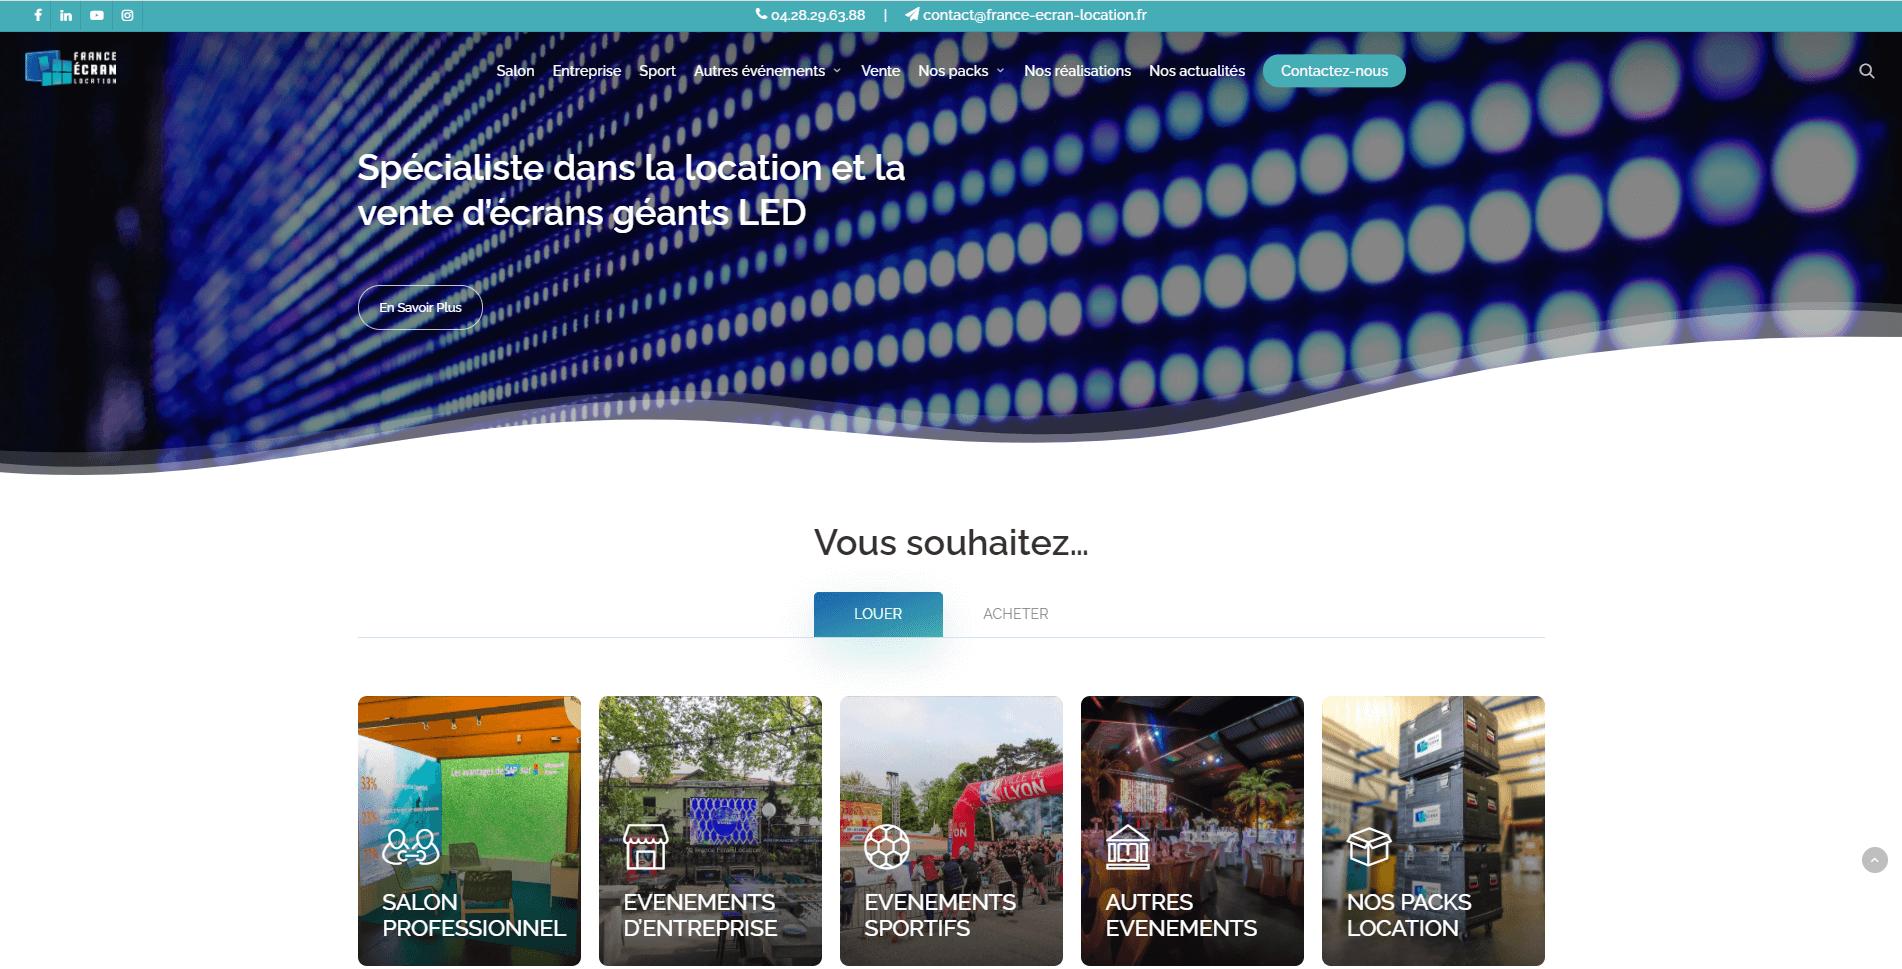 Capture d'écran site France Ecran Location